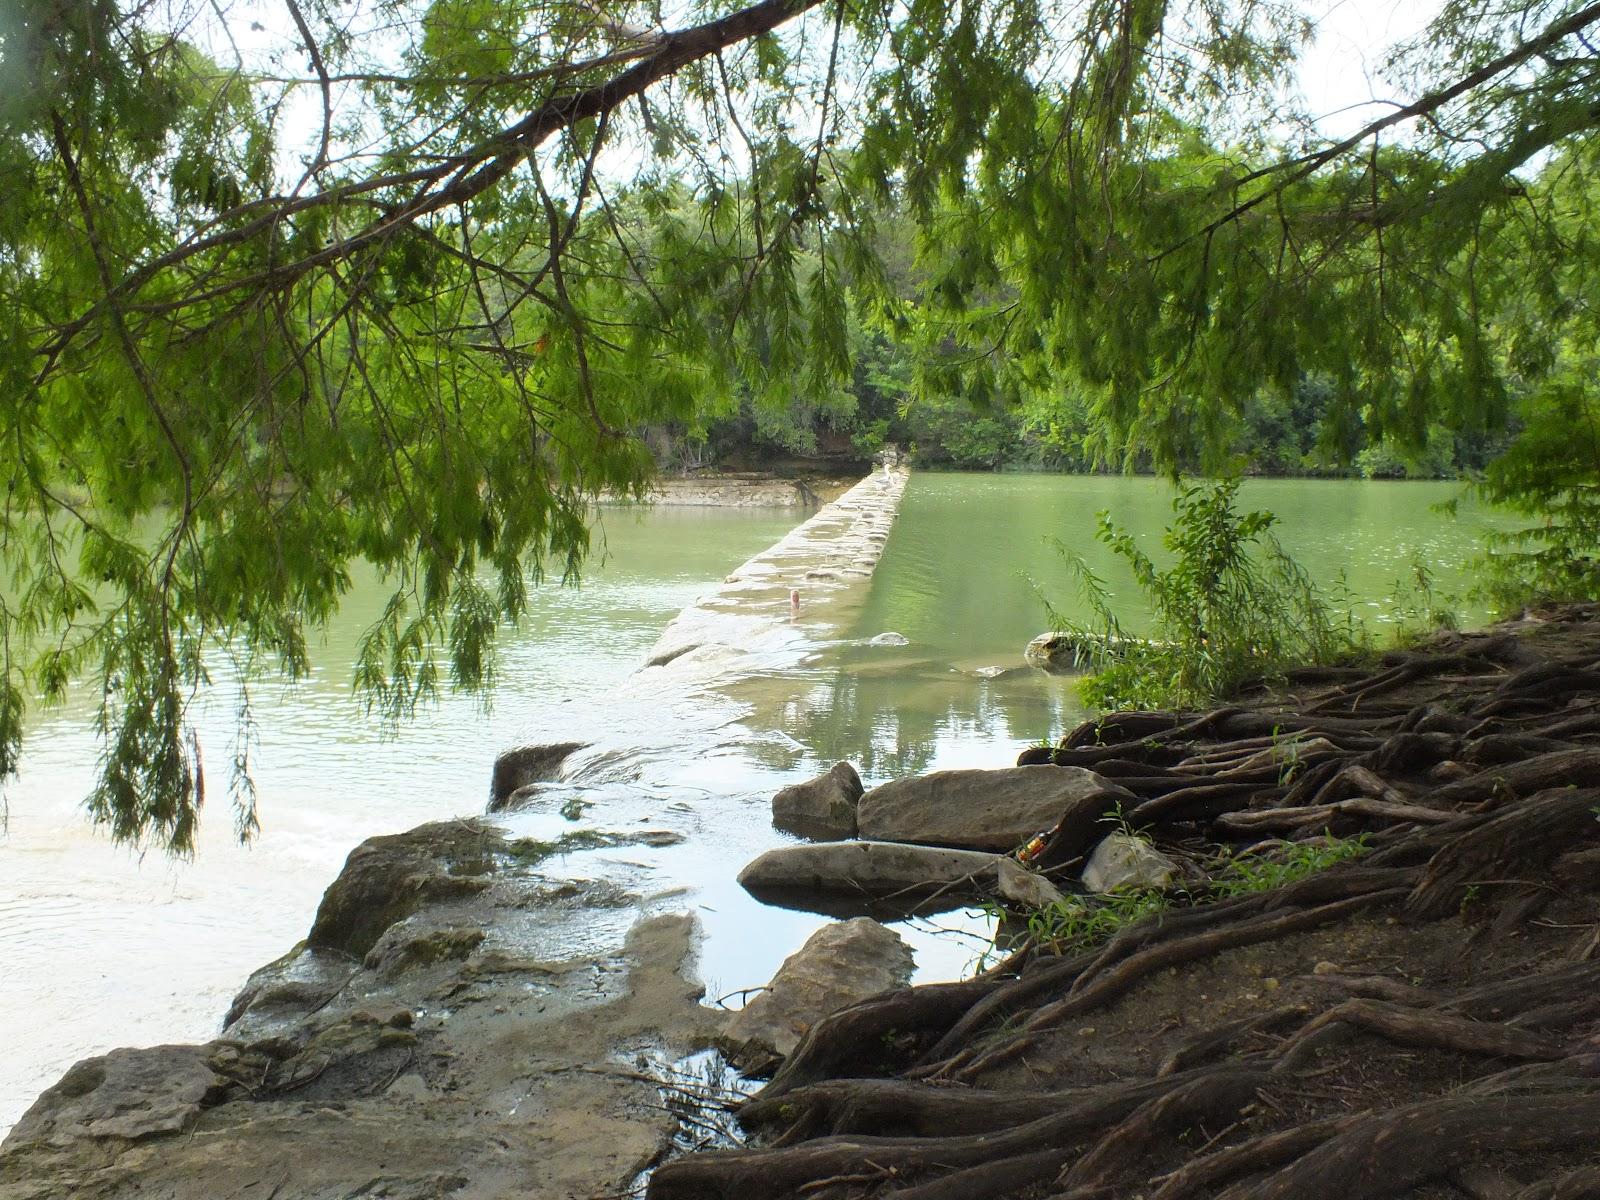 Mendez Us 3 Blanco River Fishing Trip July 2nd